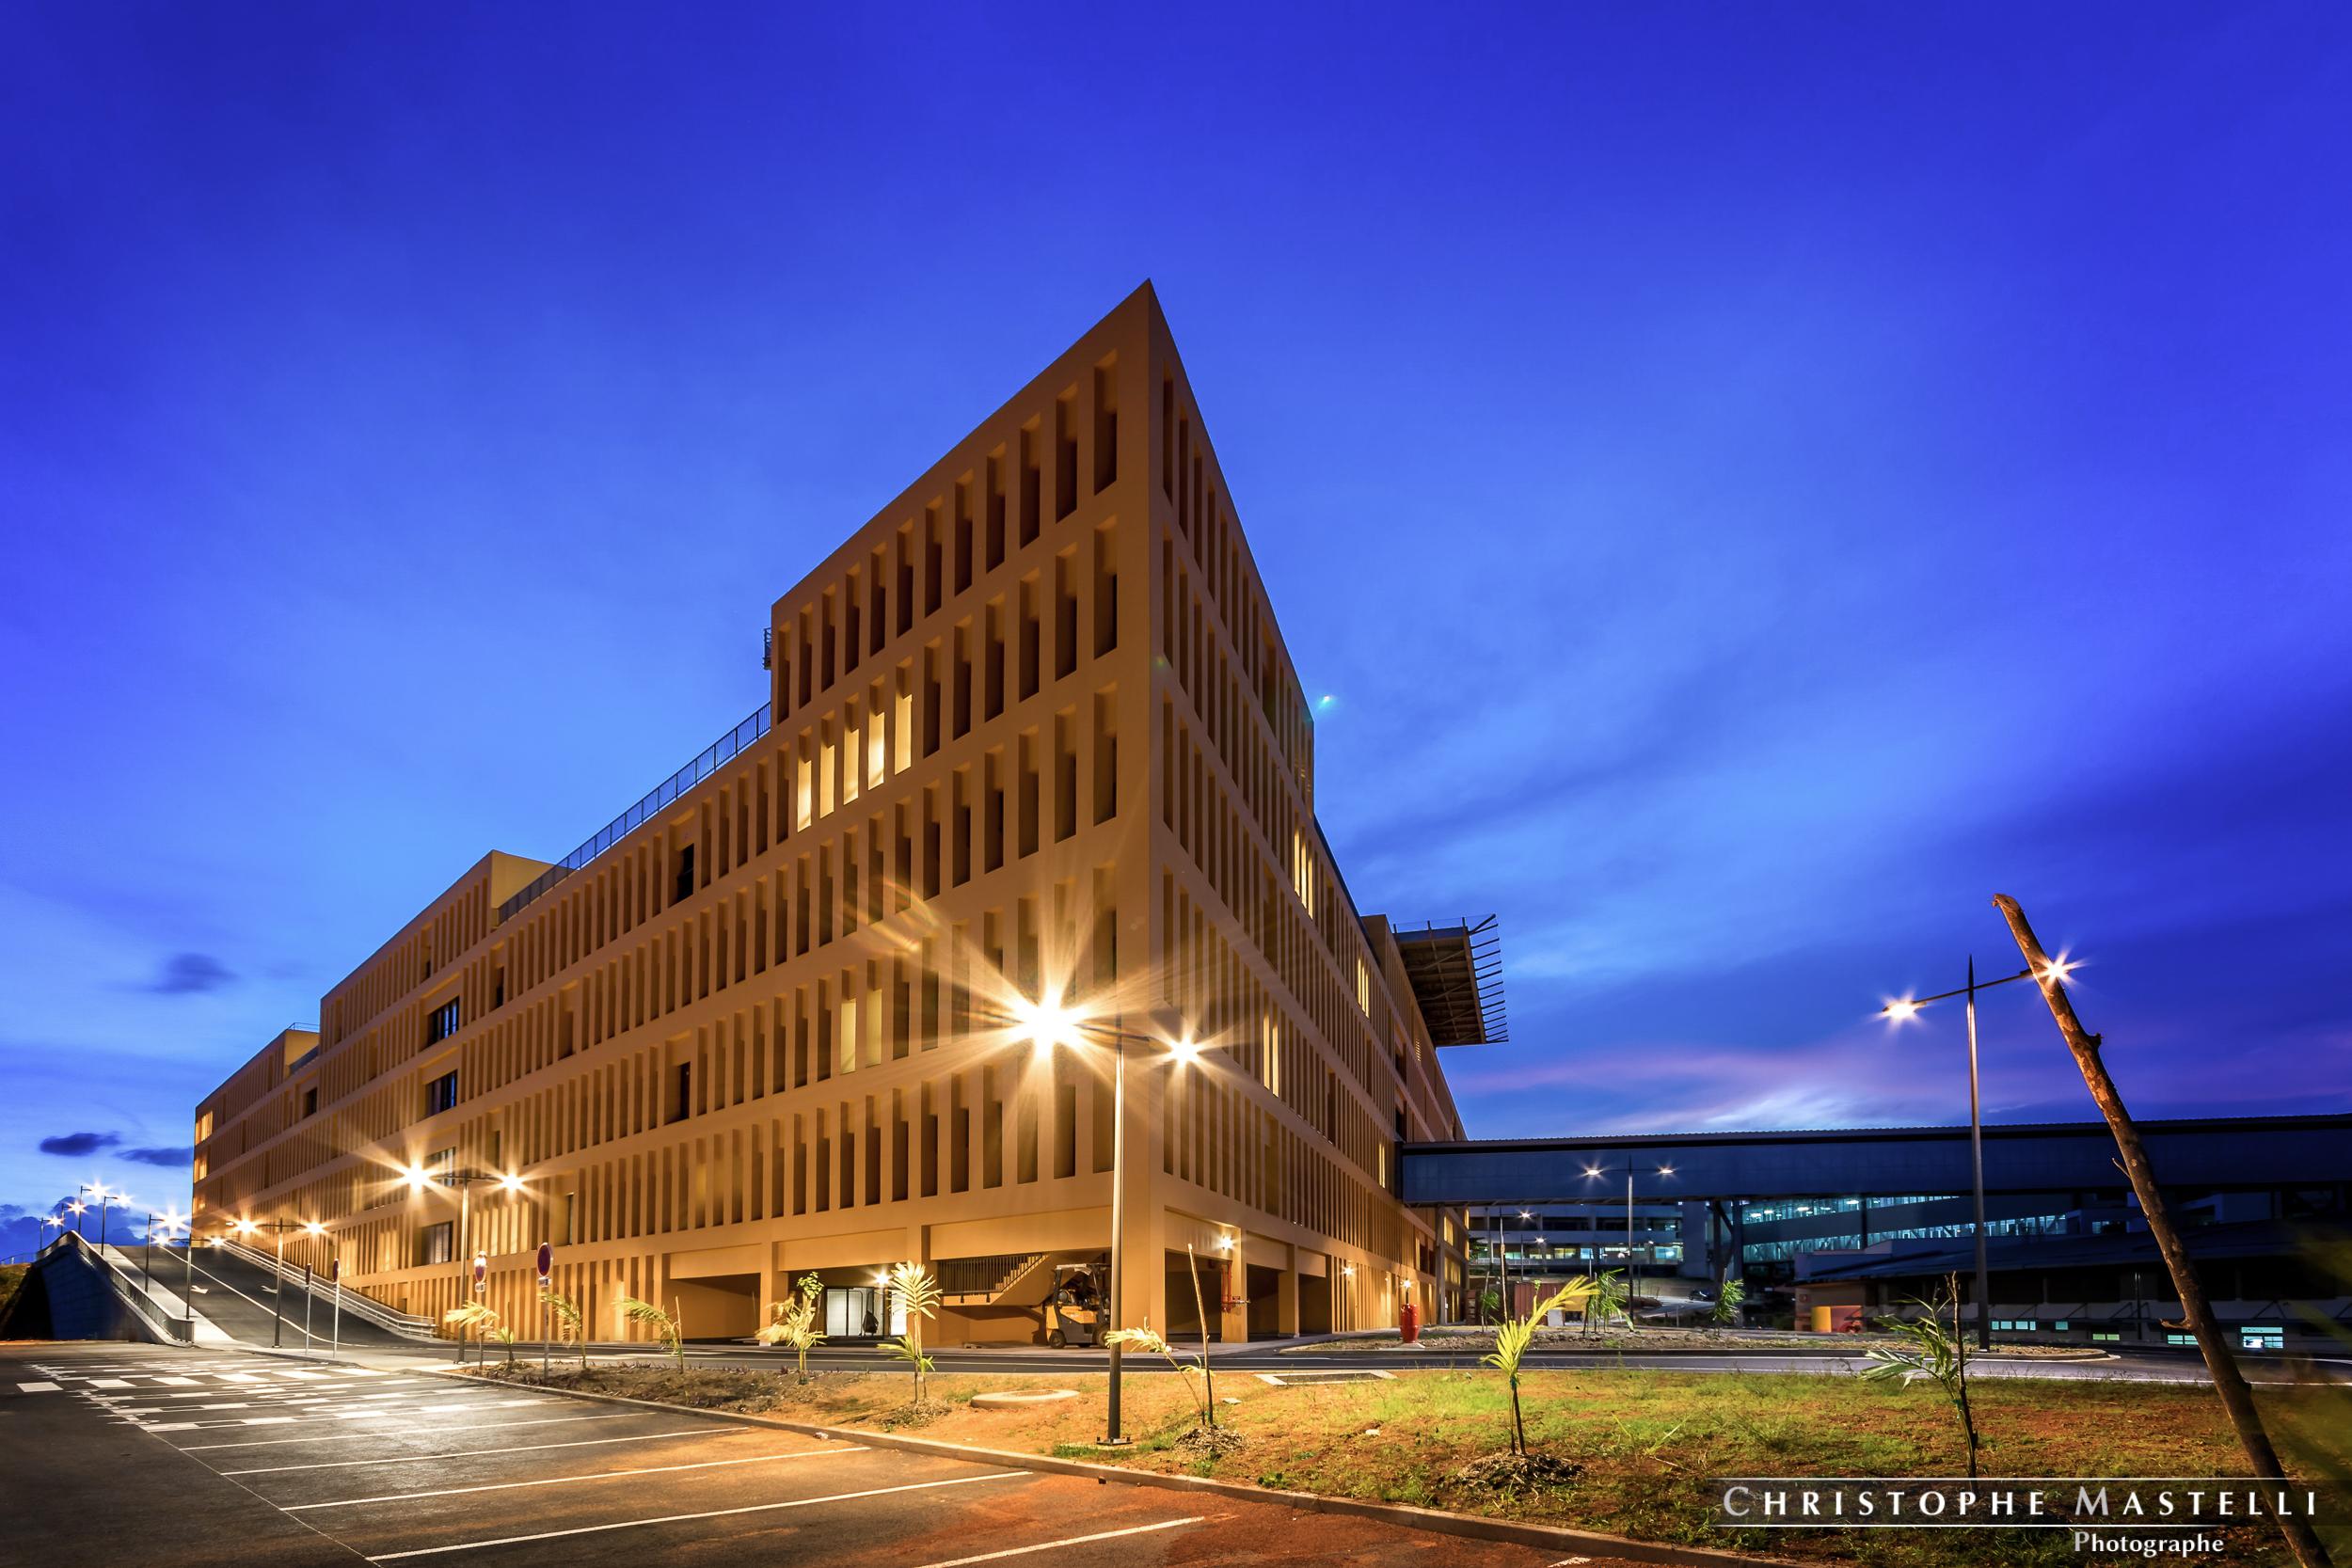 architecture suivi chantier christophe mastelli photographe